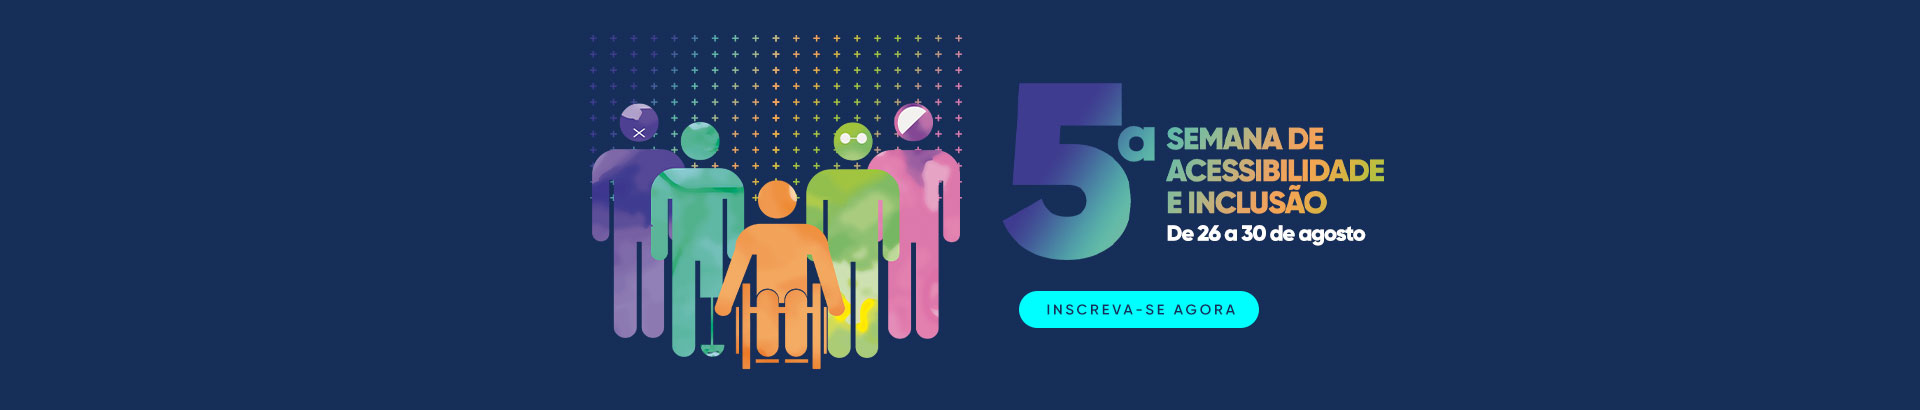 job-22930-unifebe-semana-acessibilidade-banner-site-desktop